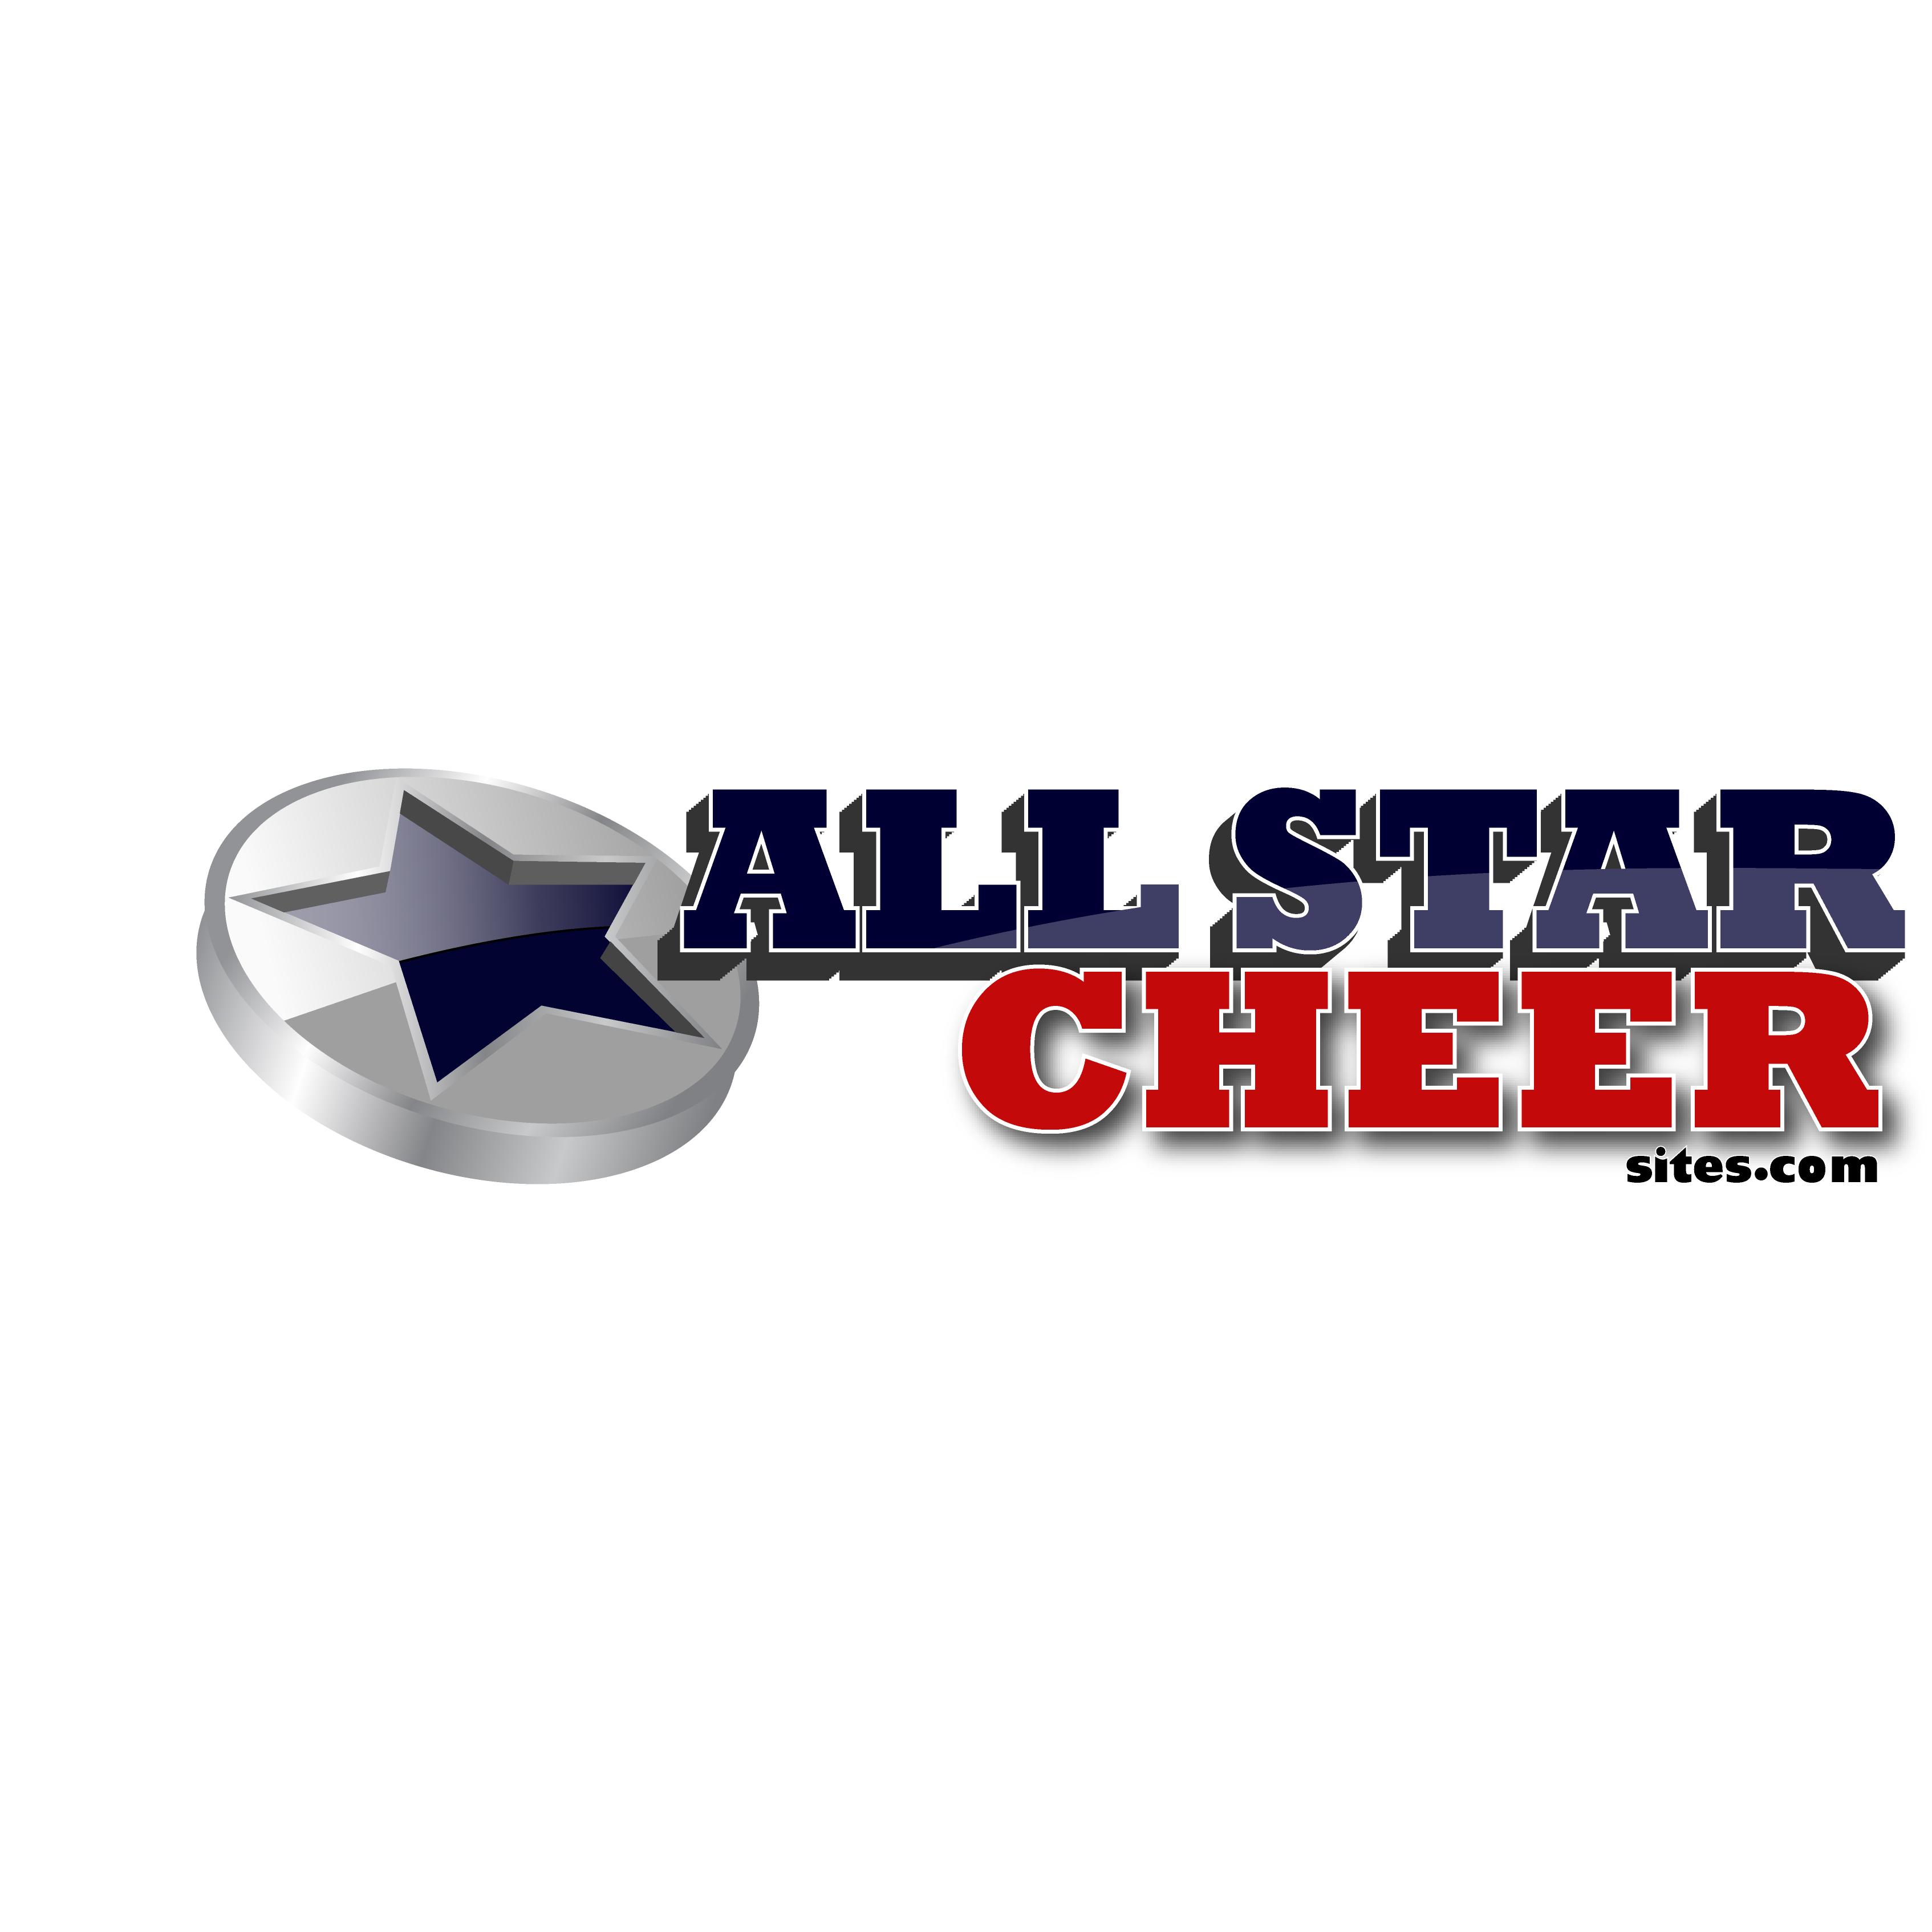 All Star Cheer Sites - Arden, NC - Website Design Services